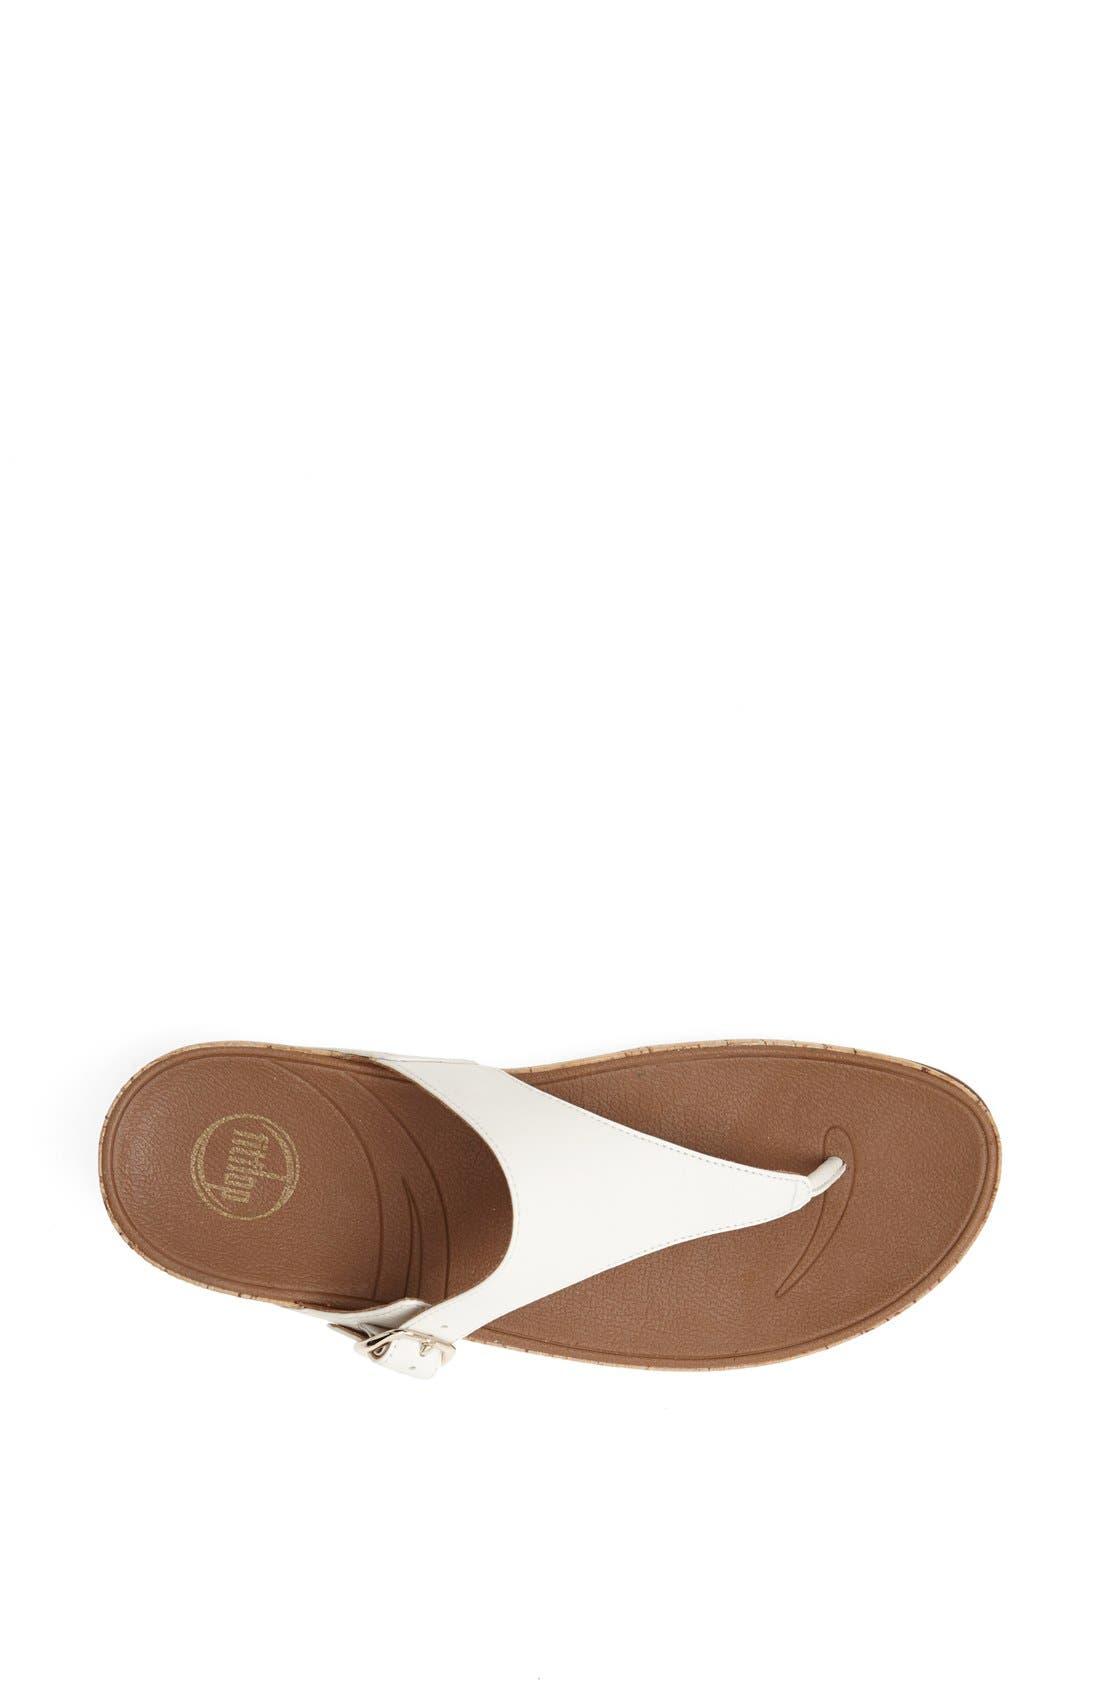 Alternate Image 3  - FitFlop 'The Skinny™' Sandal